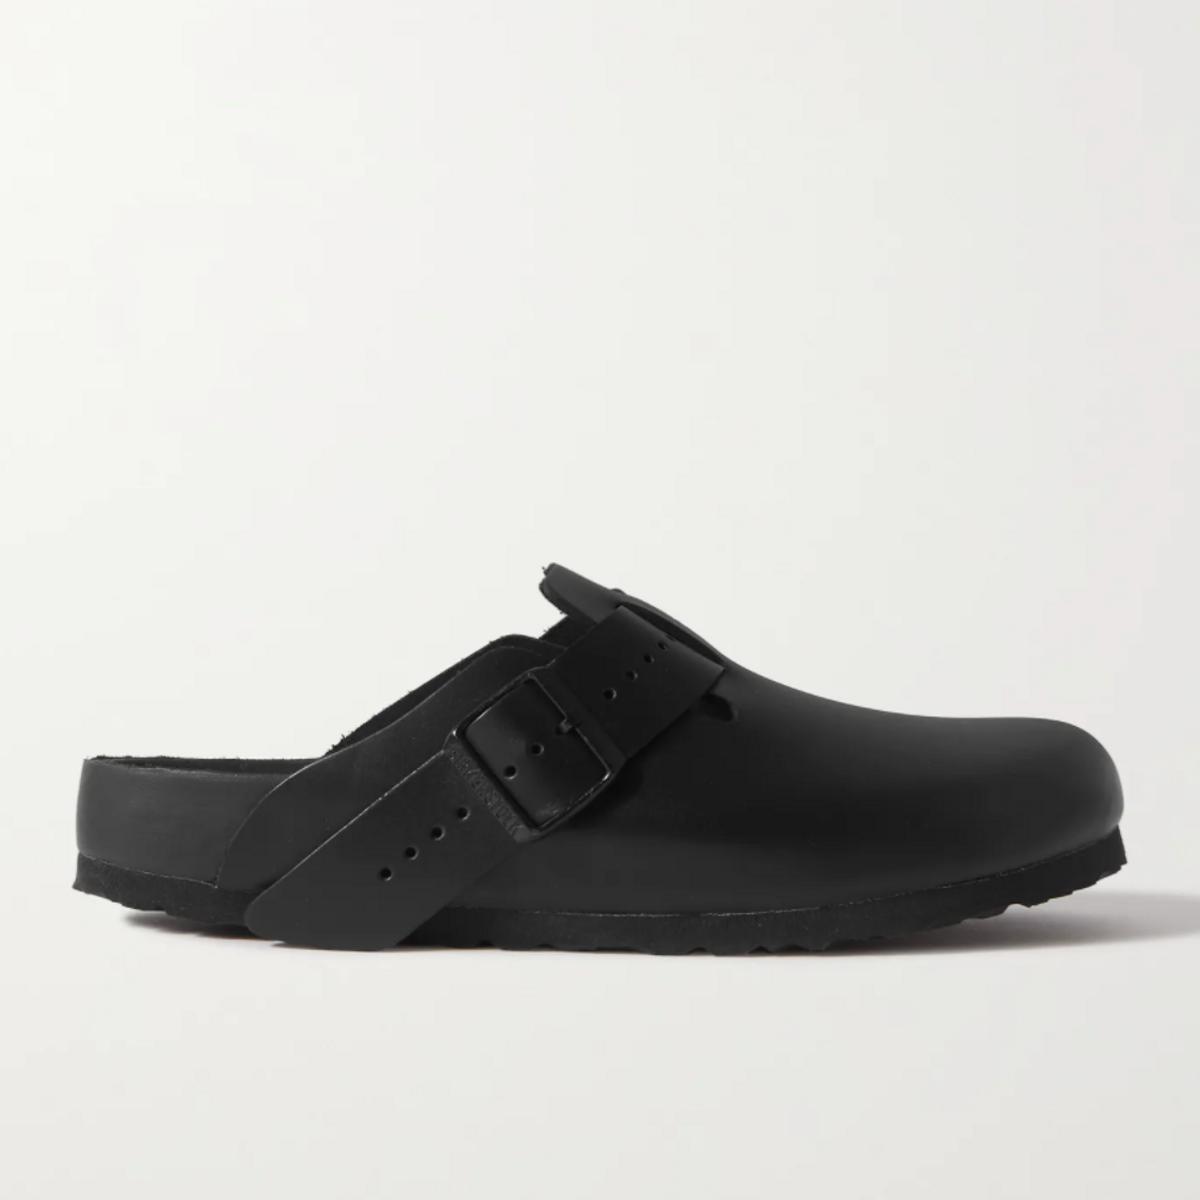 Summer + Birkenstock Boston Leather Sandals